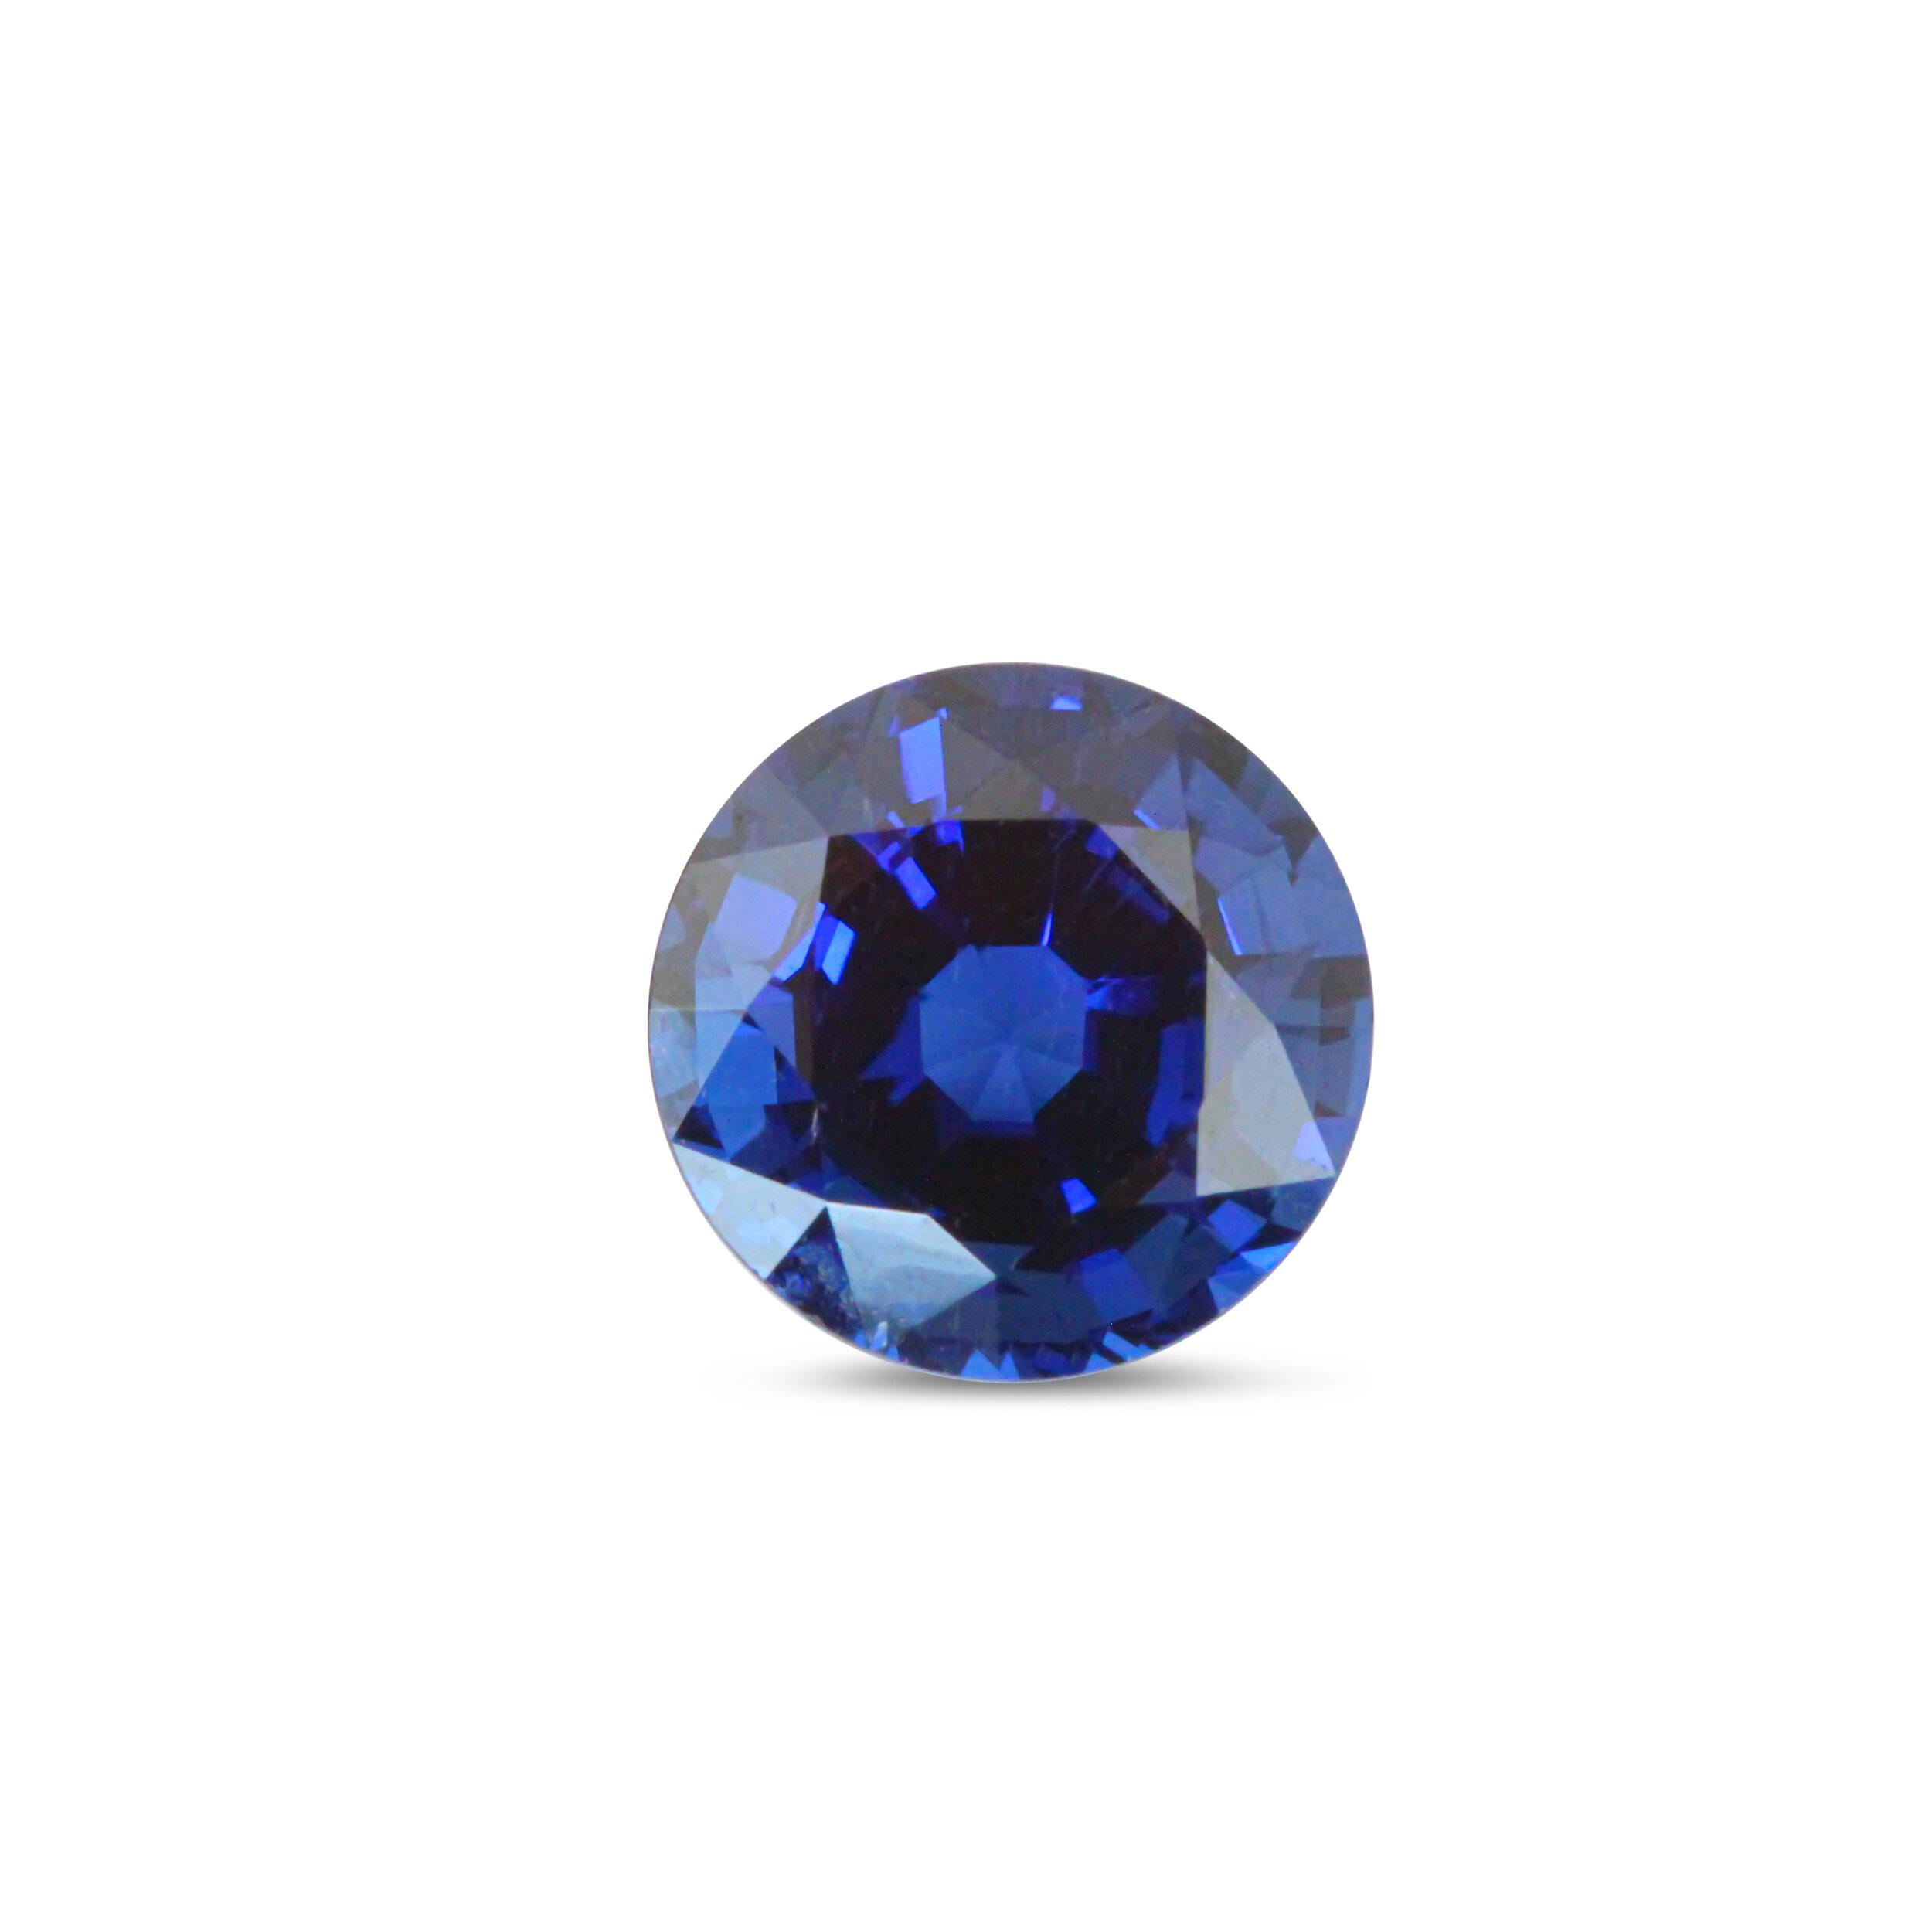 5 ct Unheated Ceylon Sapphire, AGL